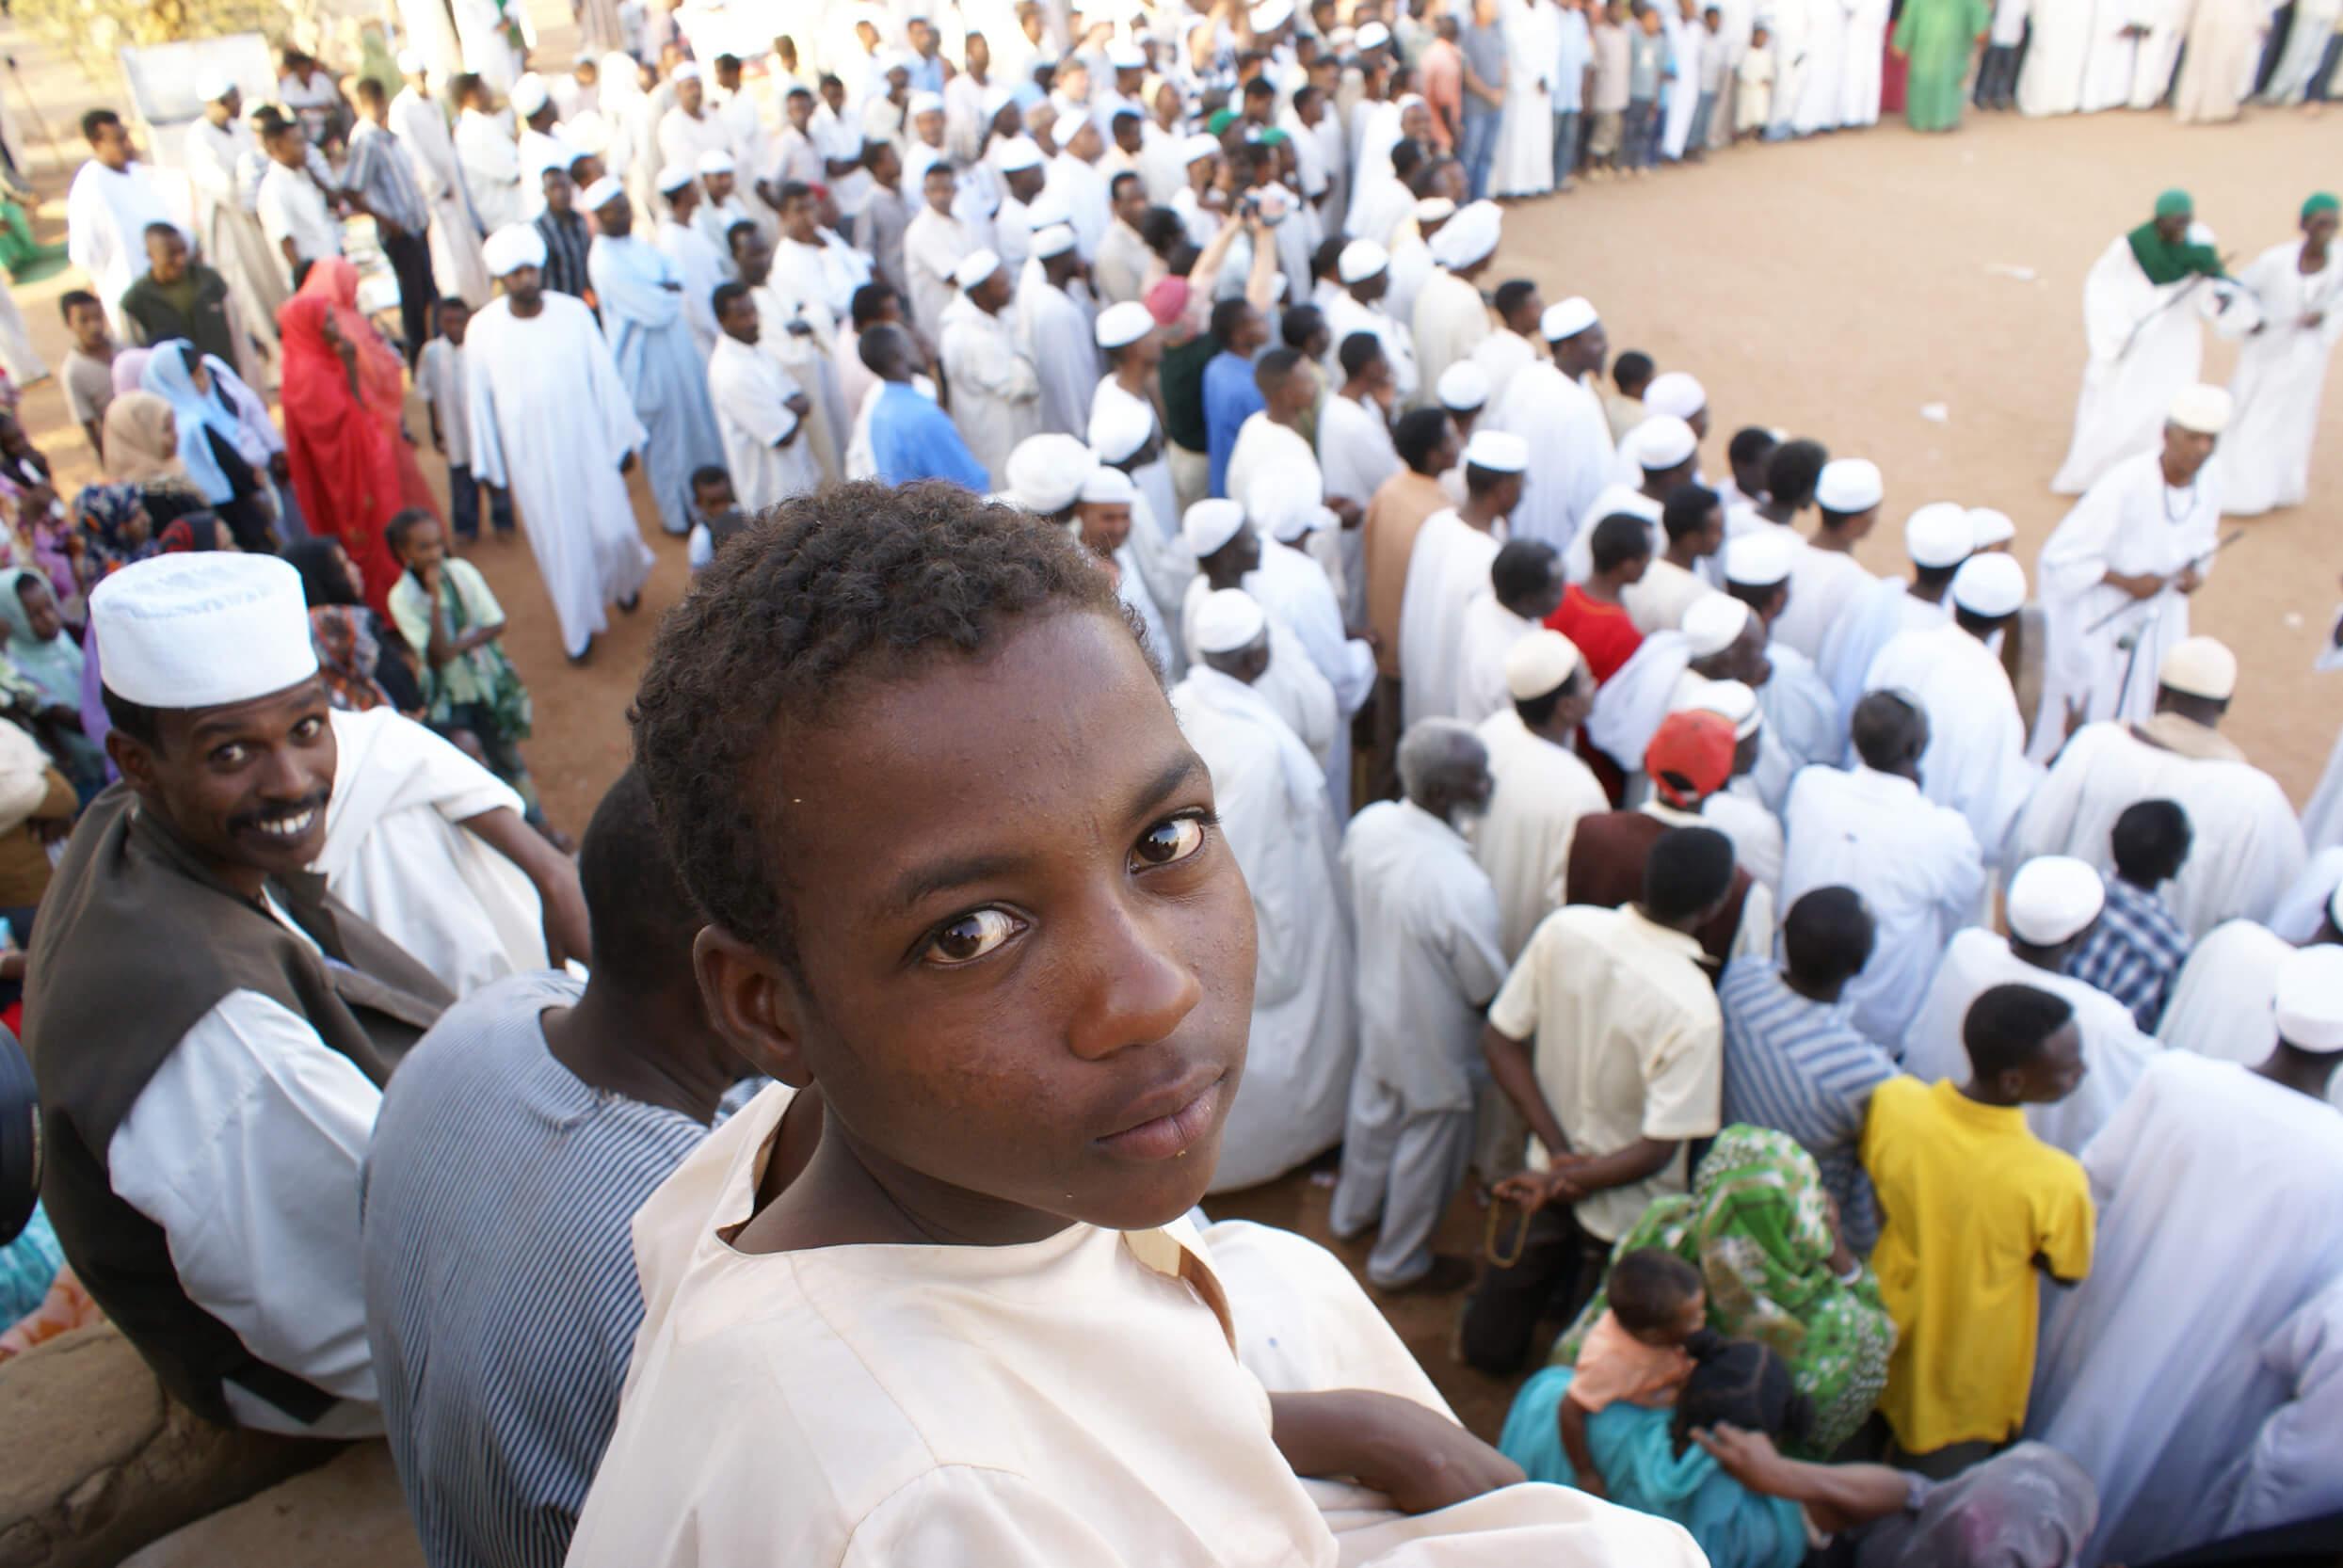 https://bubo.sk/uploads/galleries/7407/lubosfellner_sudan_4-chartum.jpg